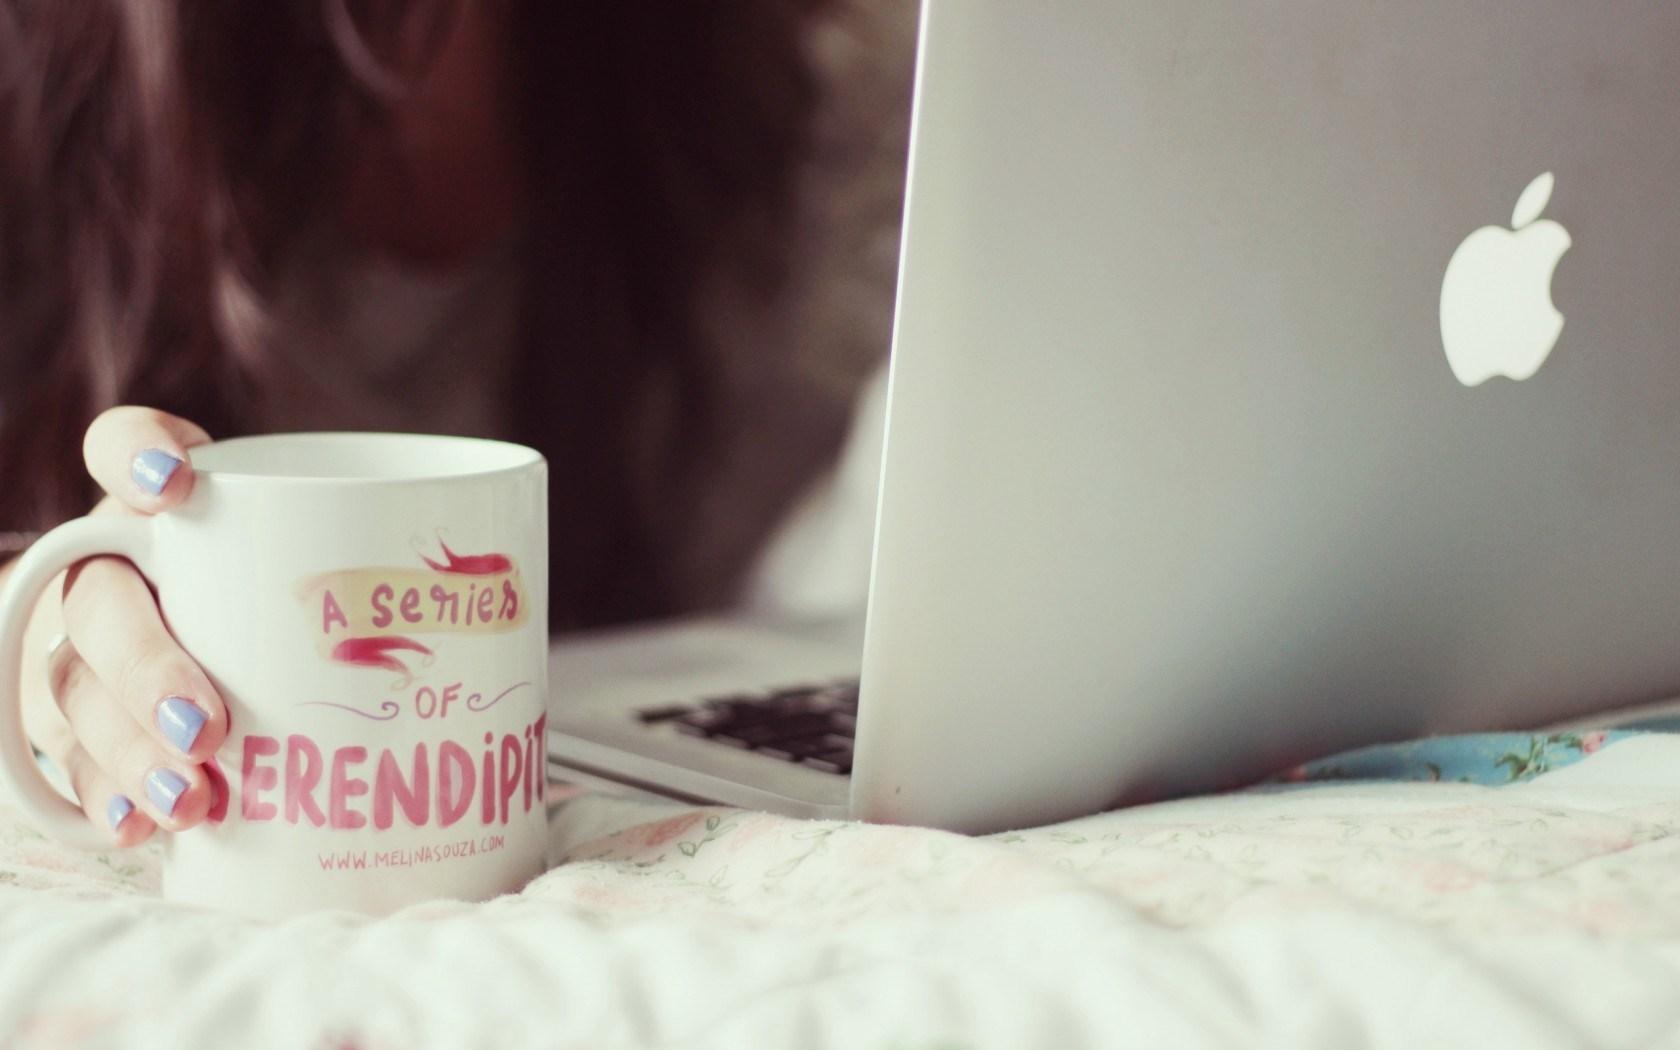 Girl Mug Notebook Apple Hi-Tech Mood HD Wallpaper